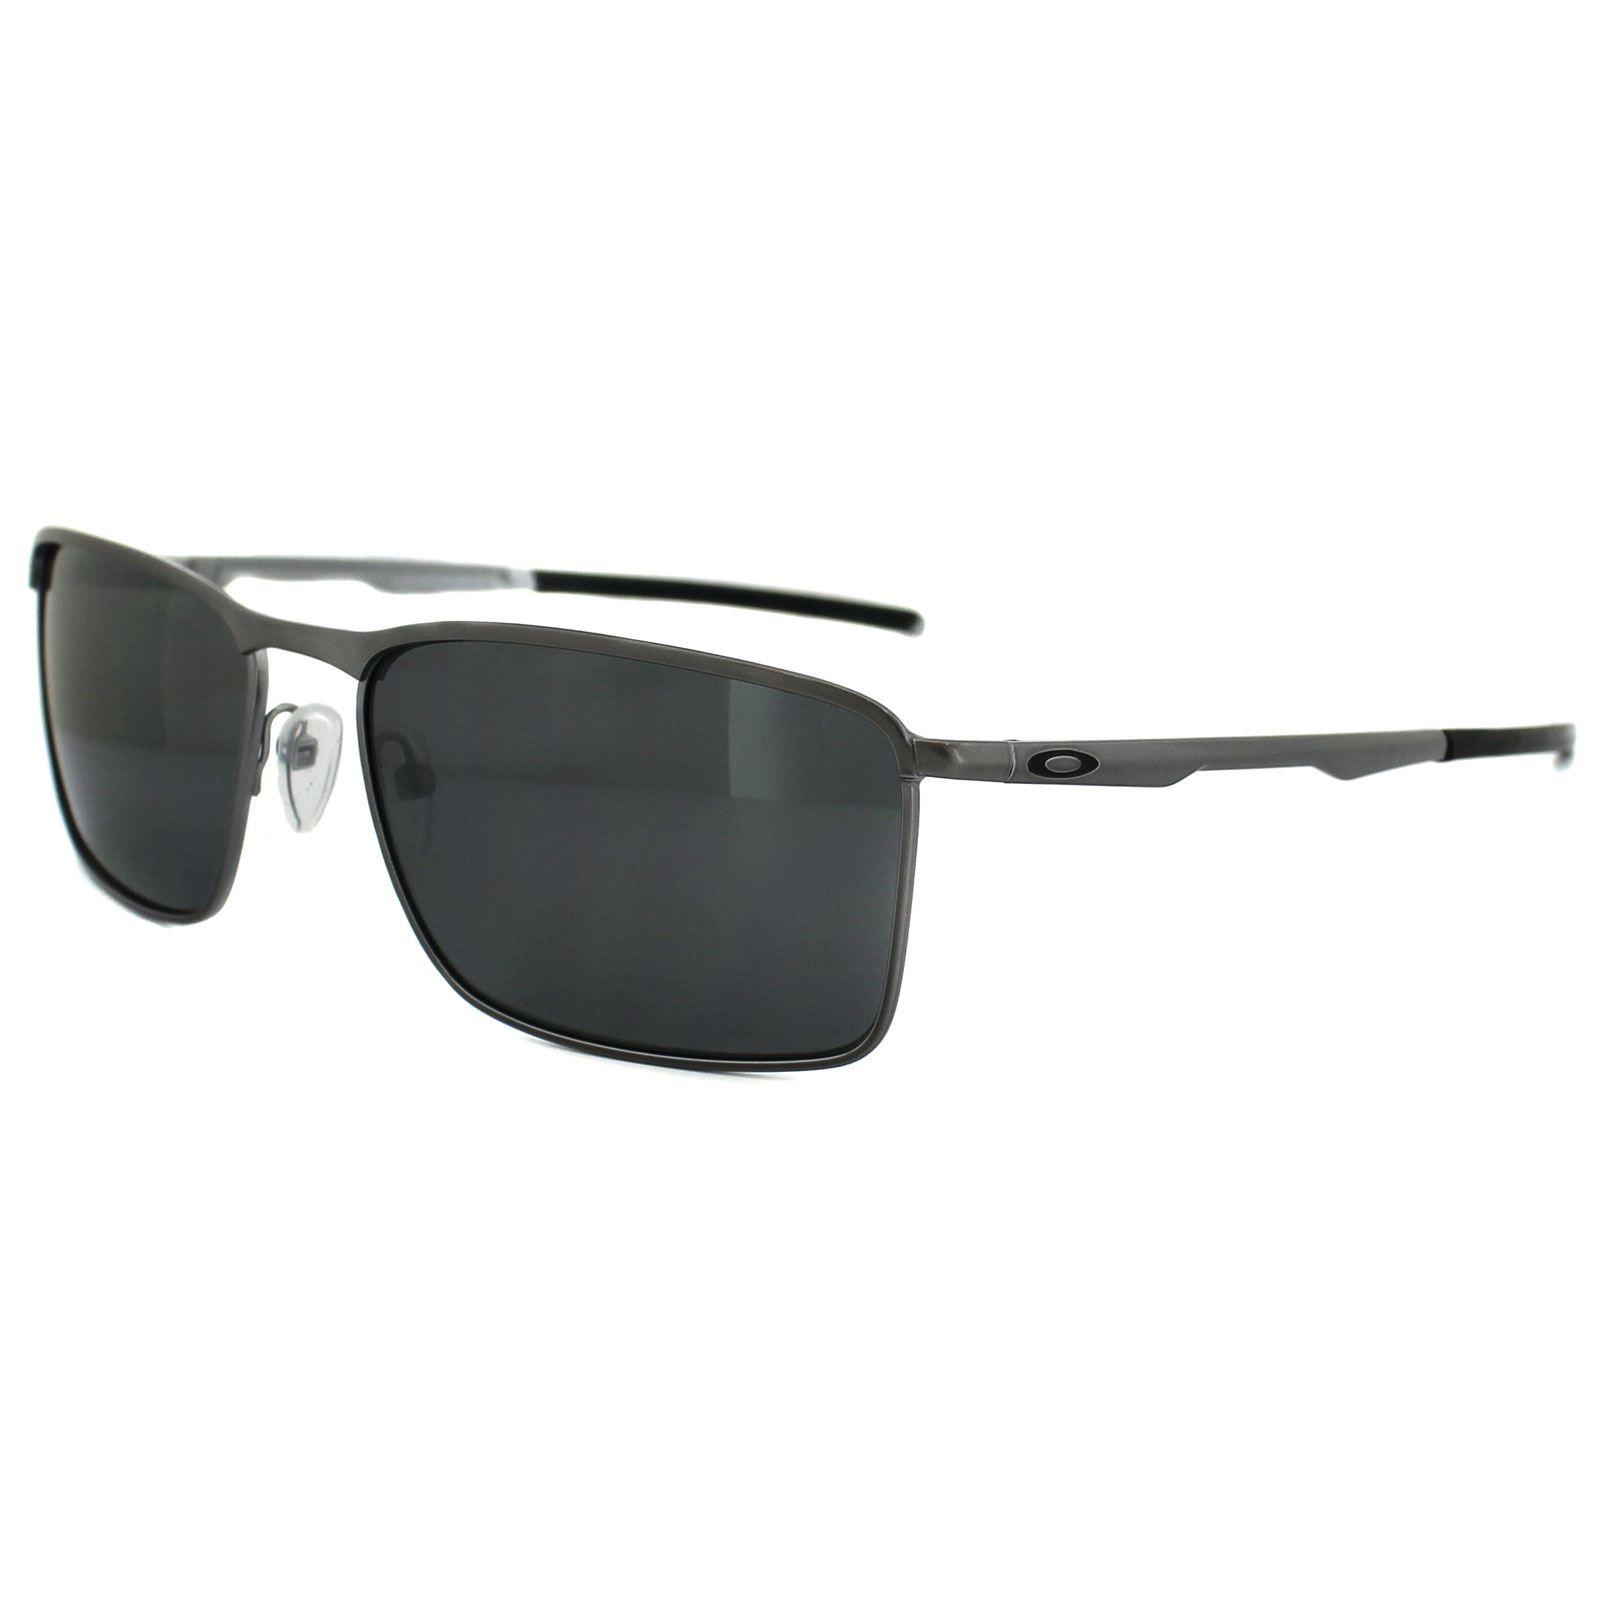 Oakley Sunglasses Conductor 6 OO4106-02 Lead Black Iridium Polarized